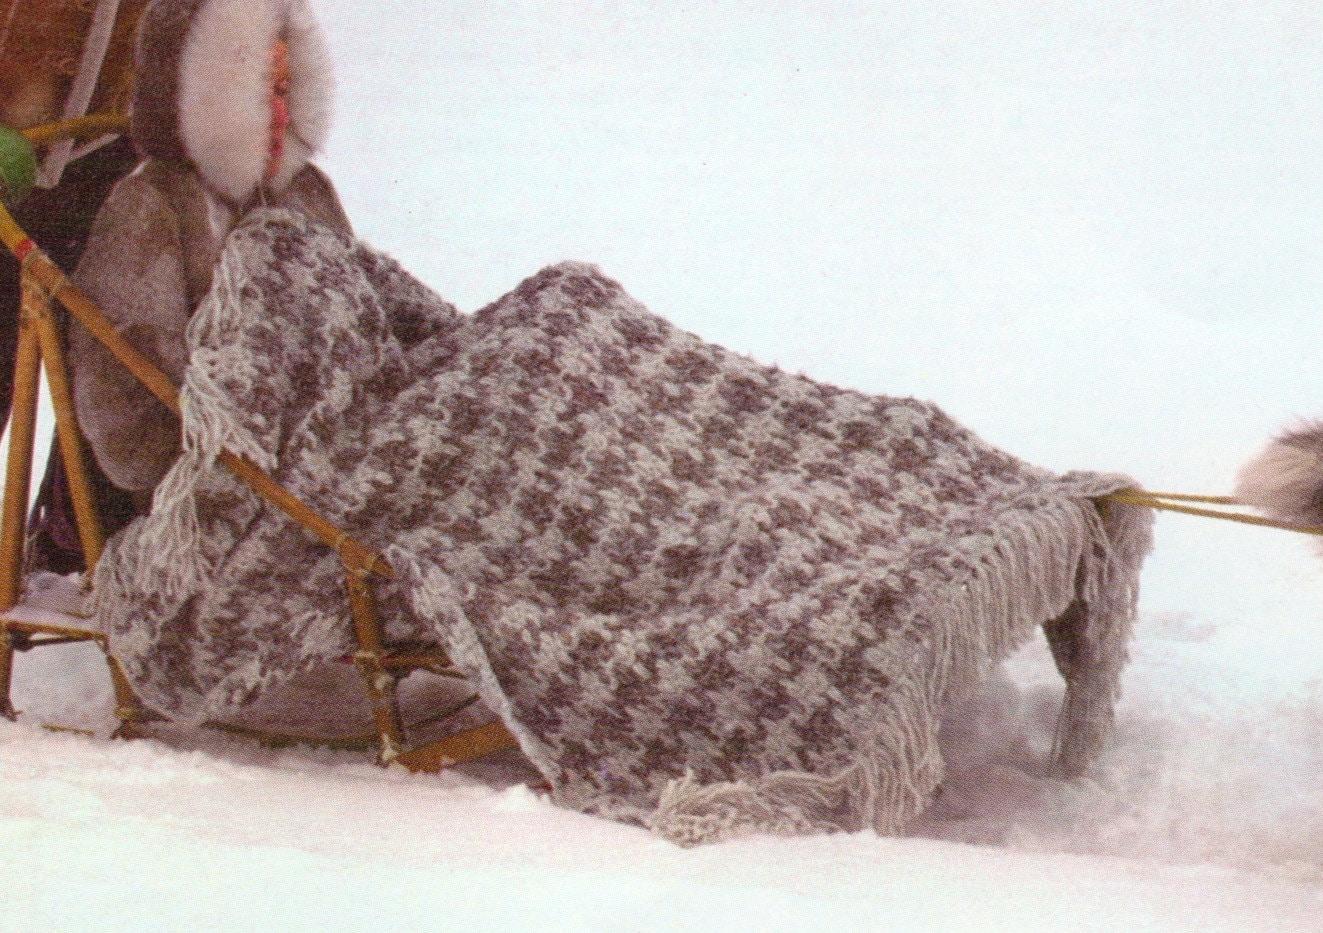 Crochet Afghan Patterns Bulky Yarn : Houndstooth Afghan Vintage Crochet Blanket Pattern chunky